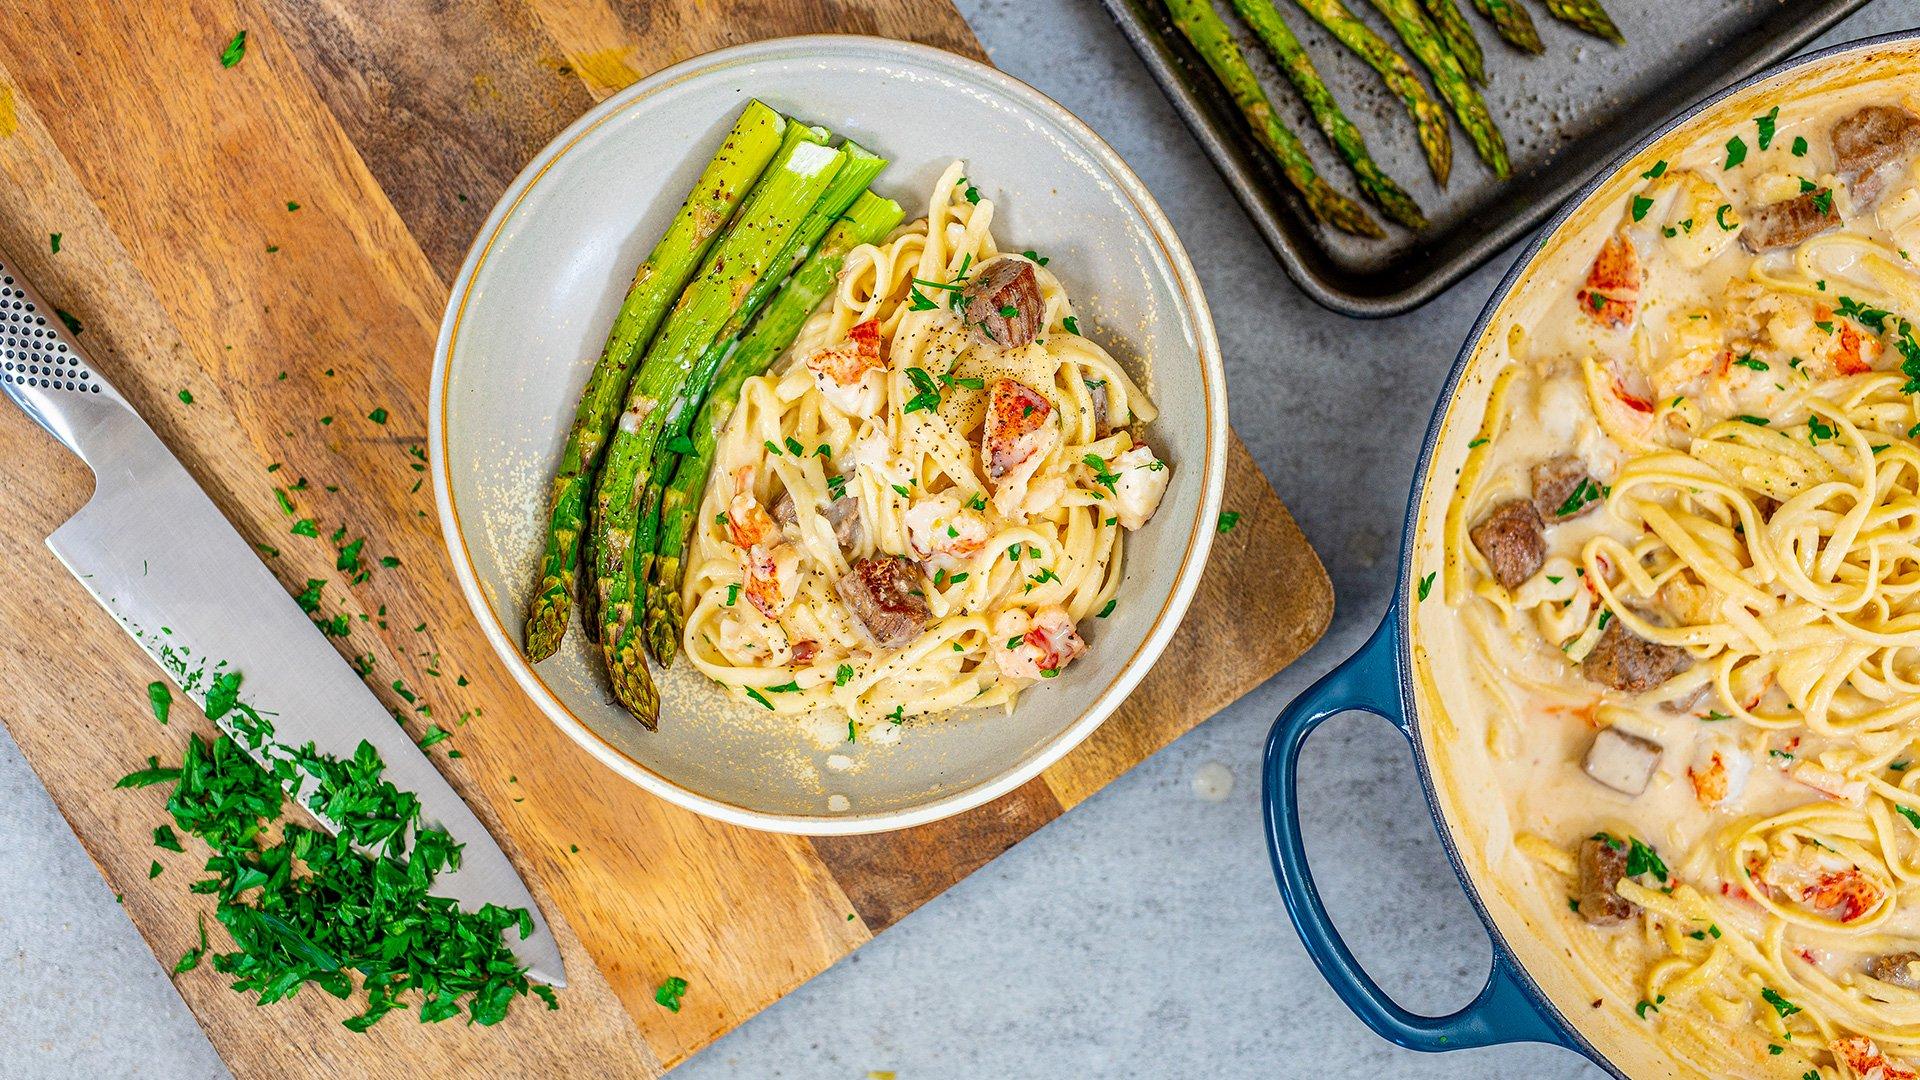 Surf and Turf Dinner for Two - Lighter Lobster Steak Pasta - Fit Men Cook